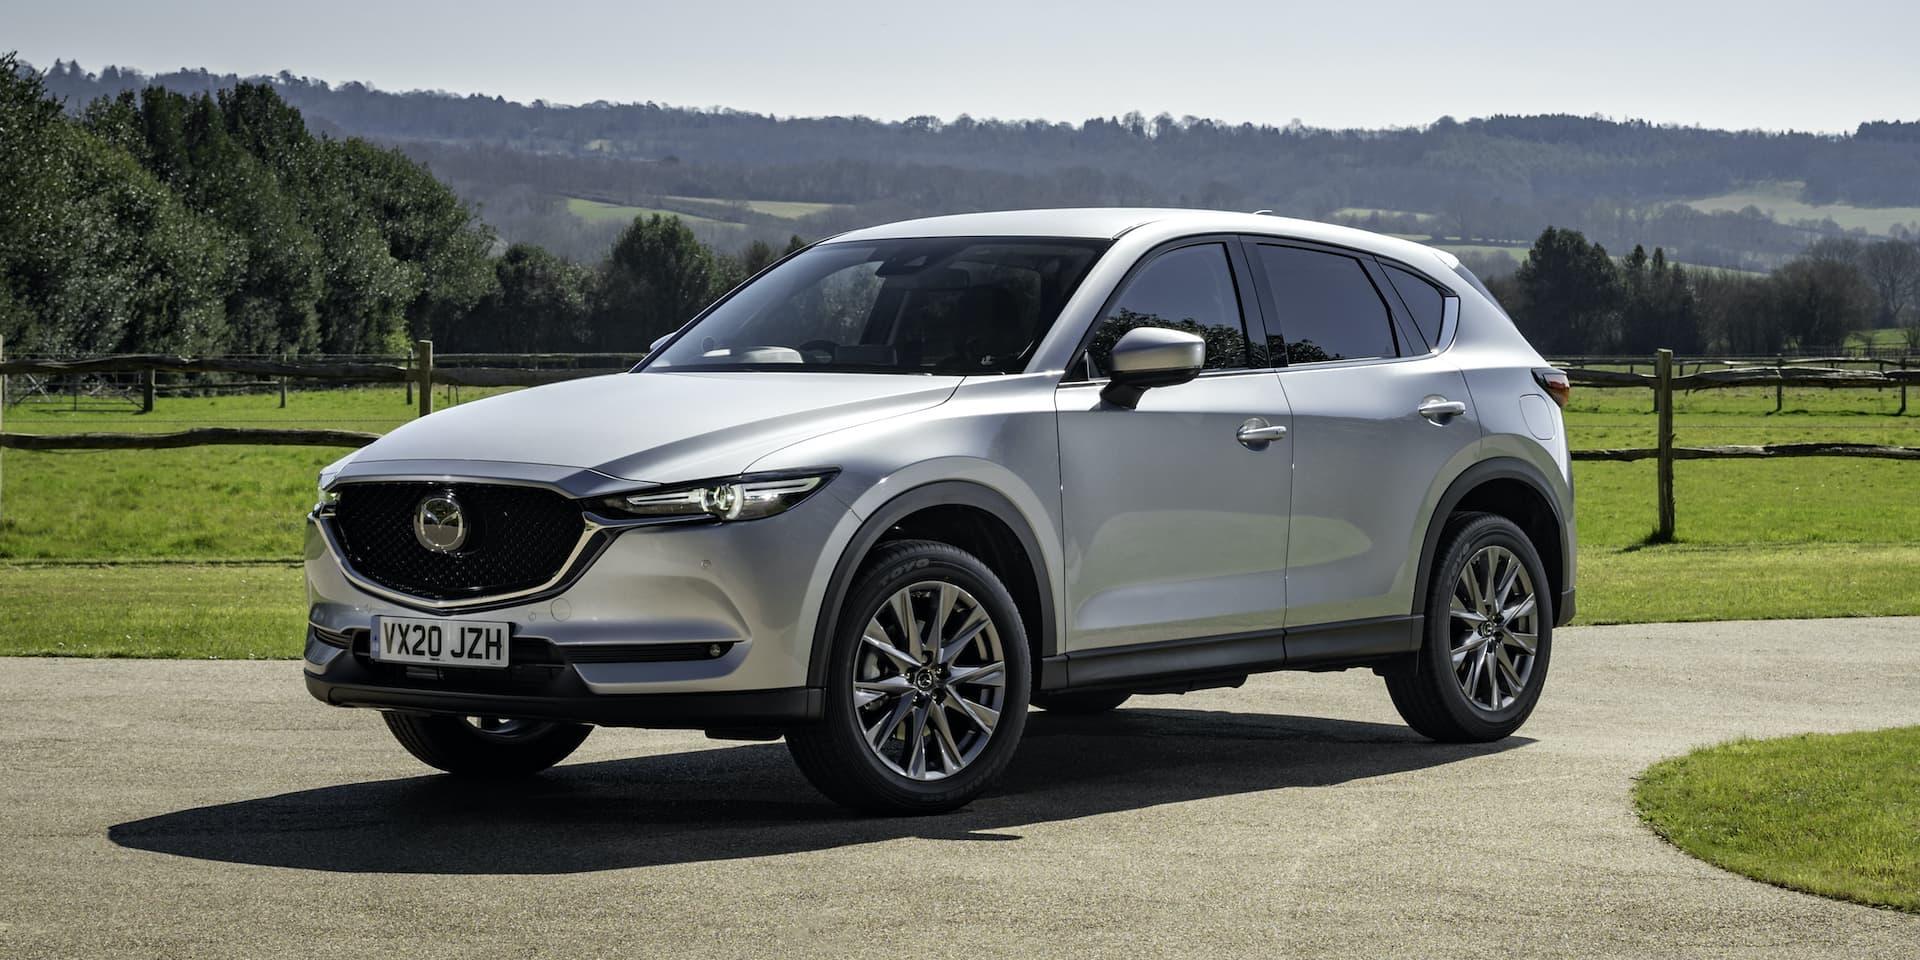 Mazda CX-5 (2017 onwards) Expert Rating